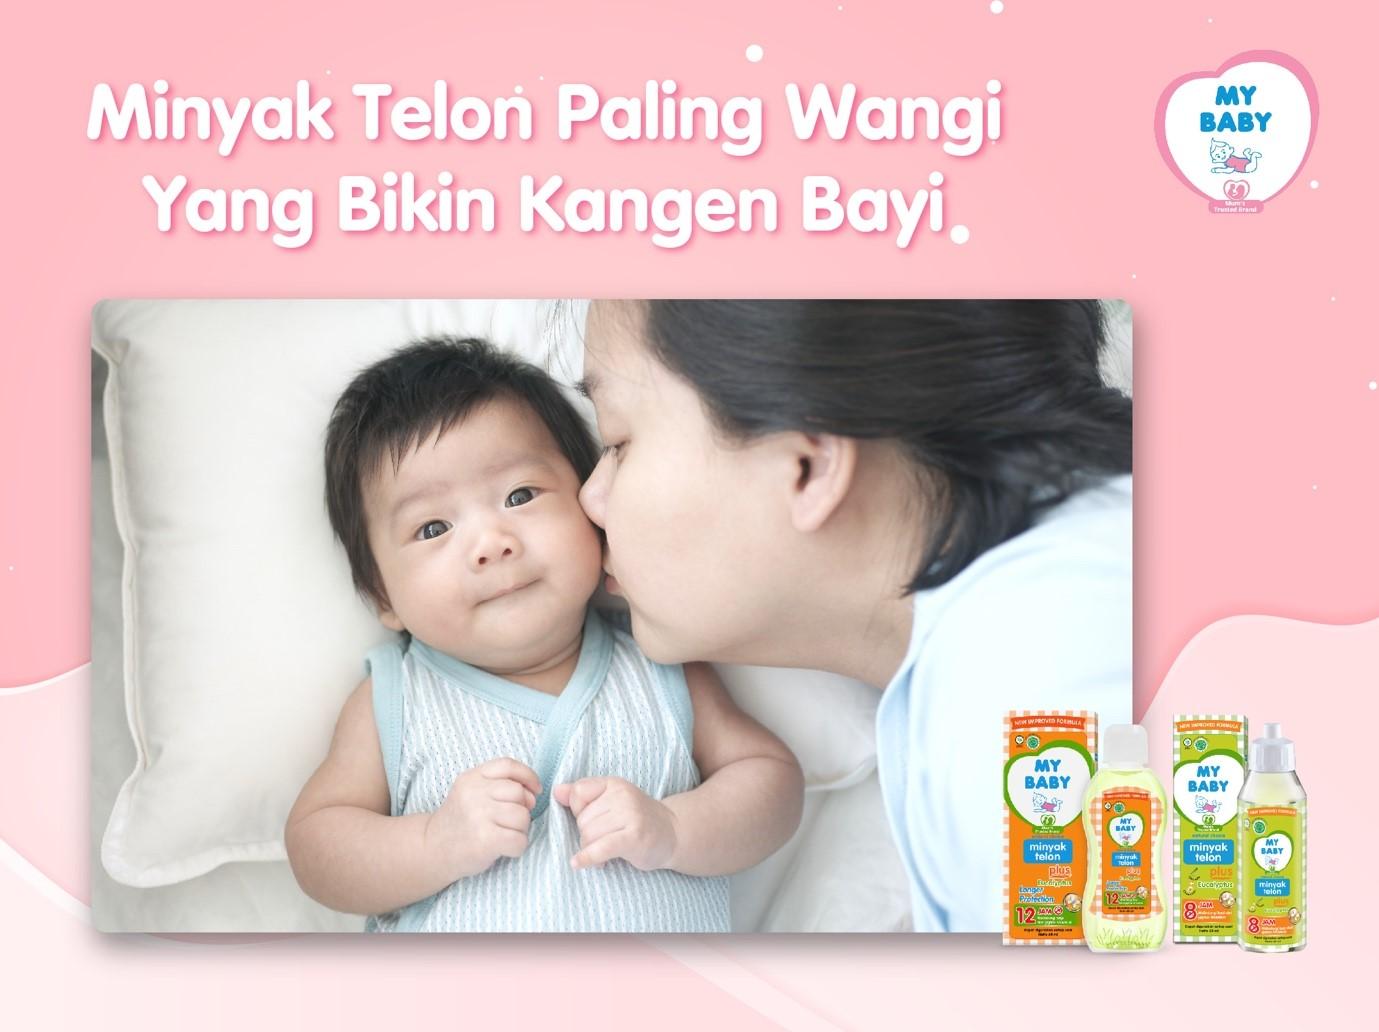 Minyak Telon Paling Wangi Yang Bikin Kangen Bayi